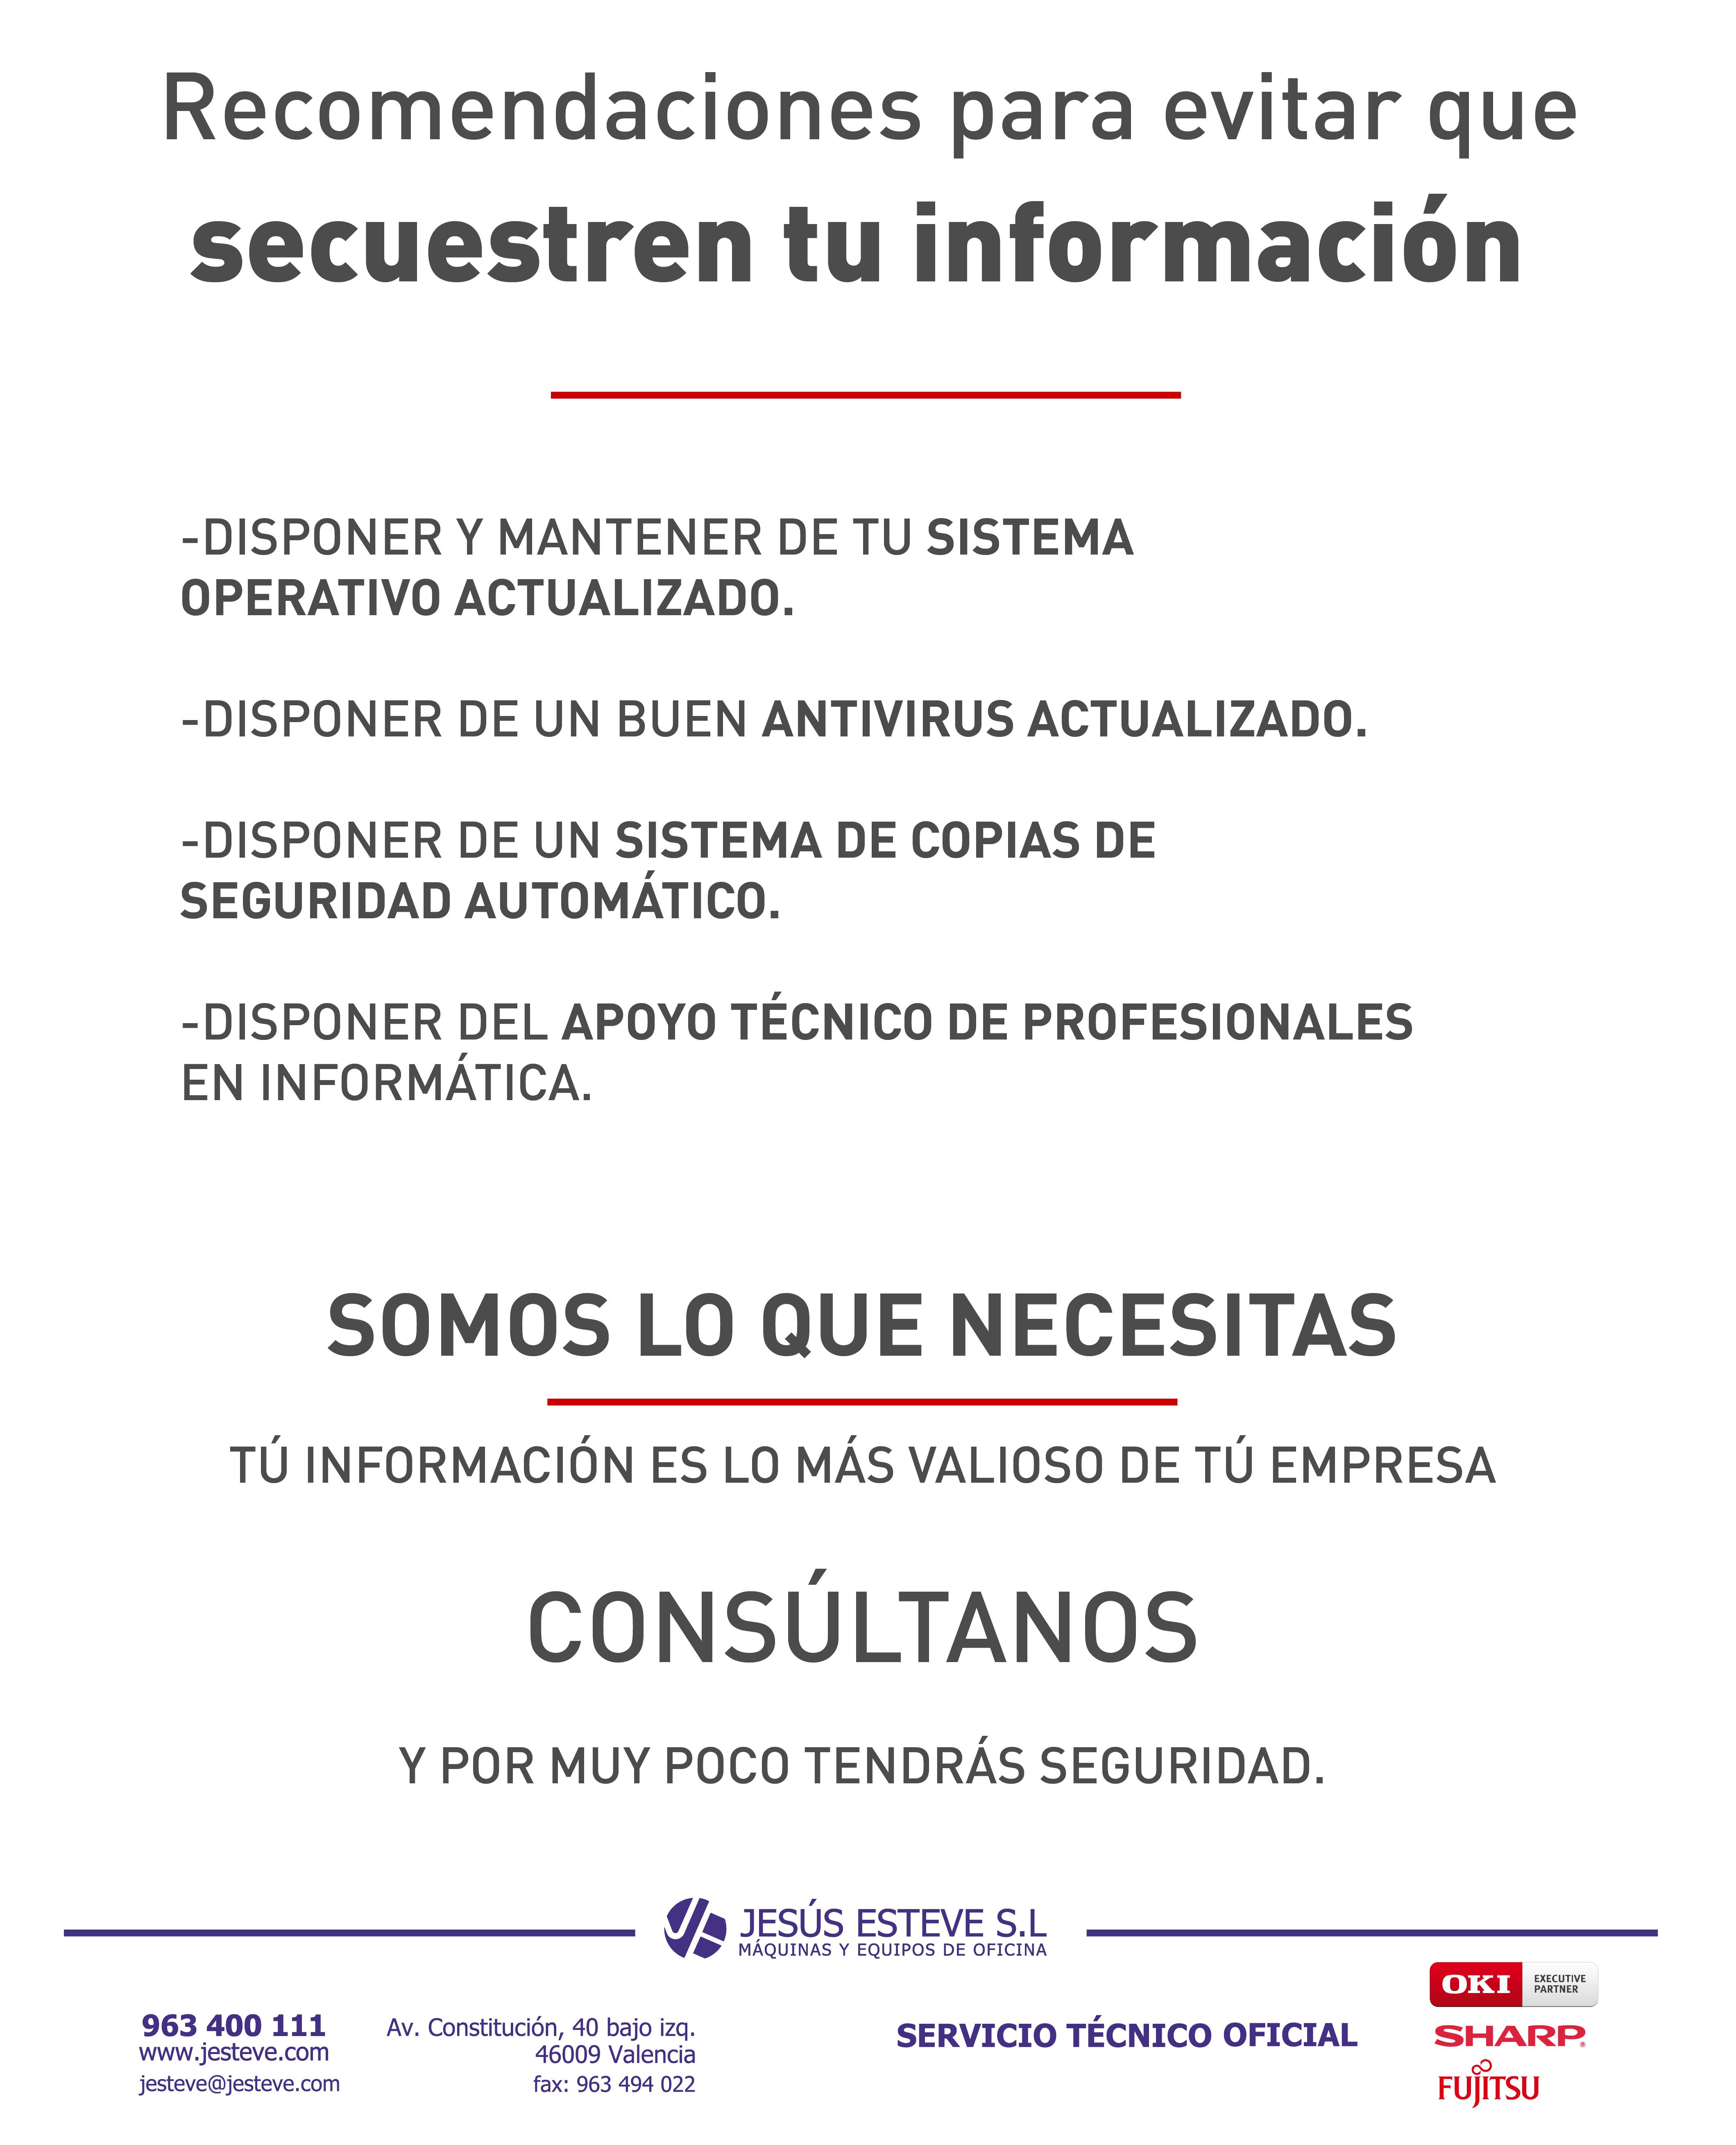 newsletter_plantilla_JE